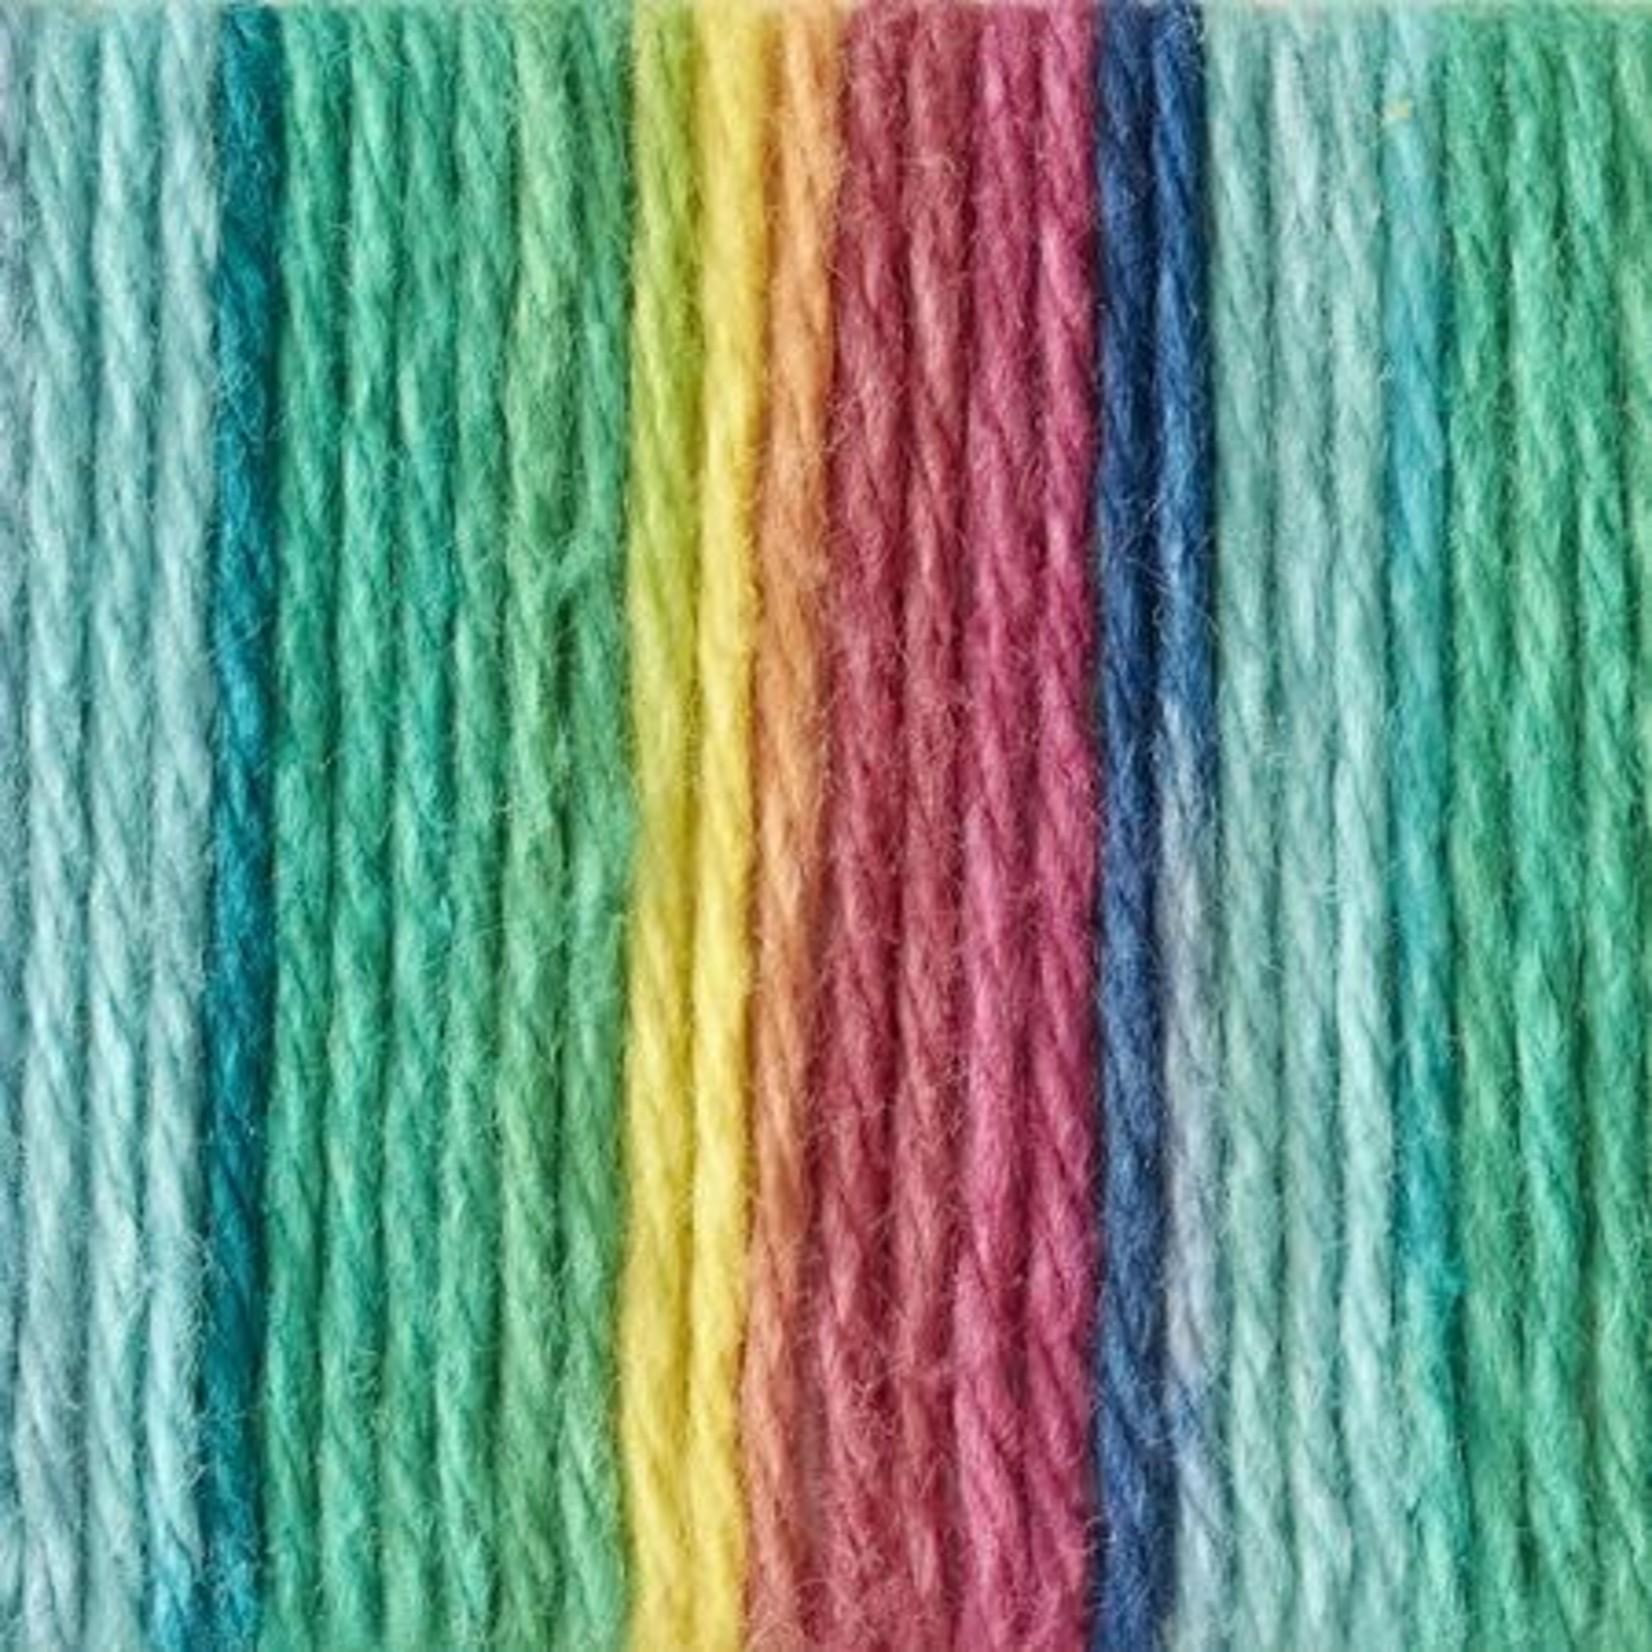 Bernat Handicrafter Cotton Yarn - Big Ball (4 - Medium) By Bernat